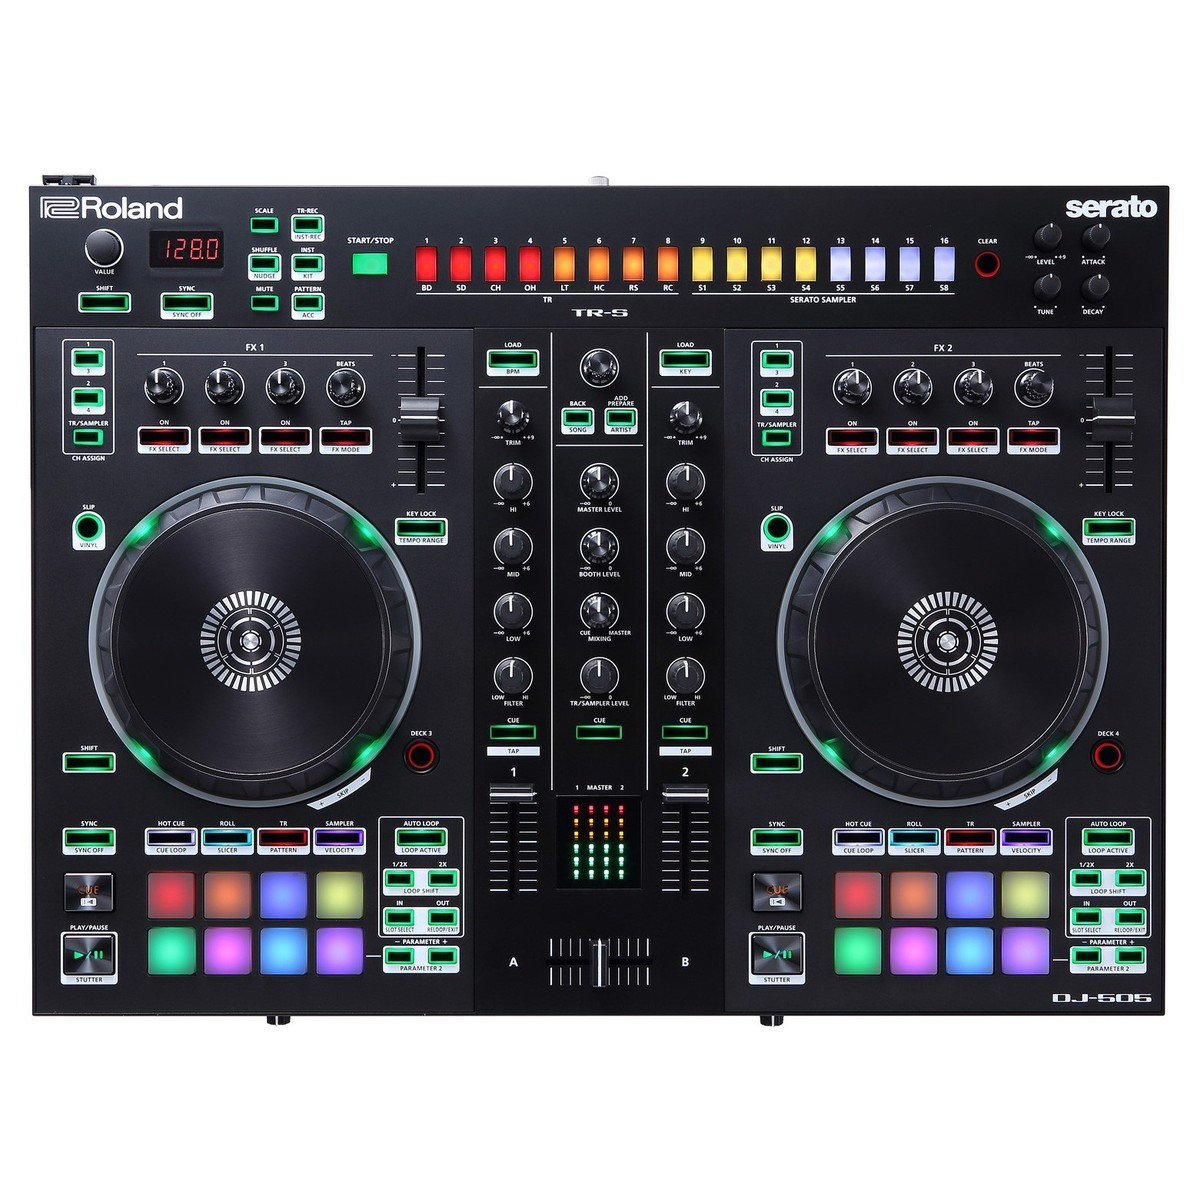 Roland Dj 505 Dj Controller At Gear4music